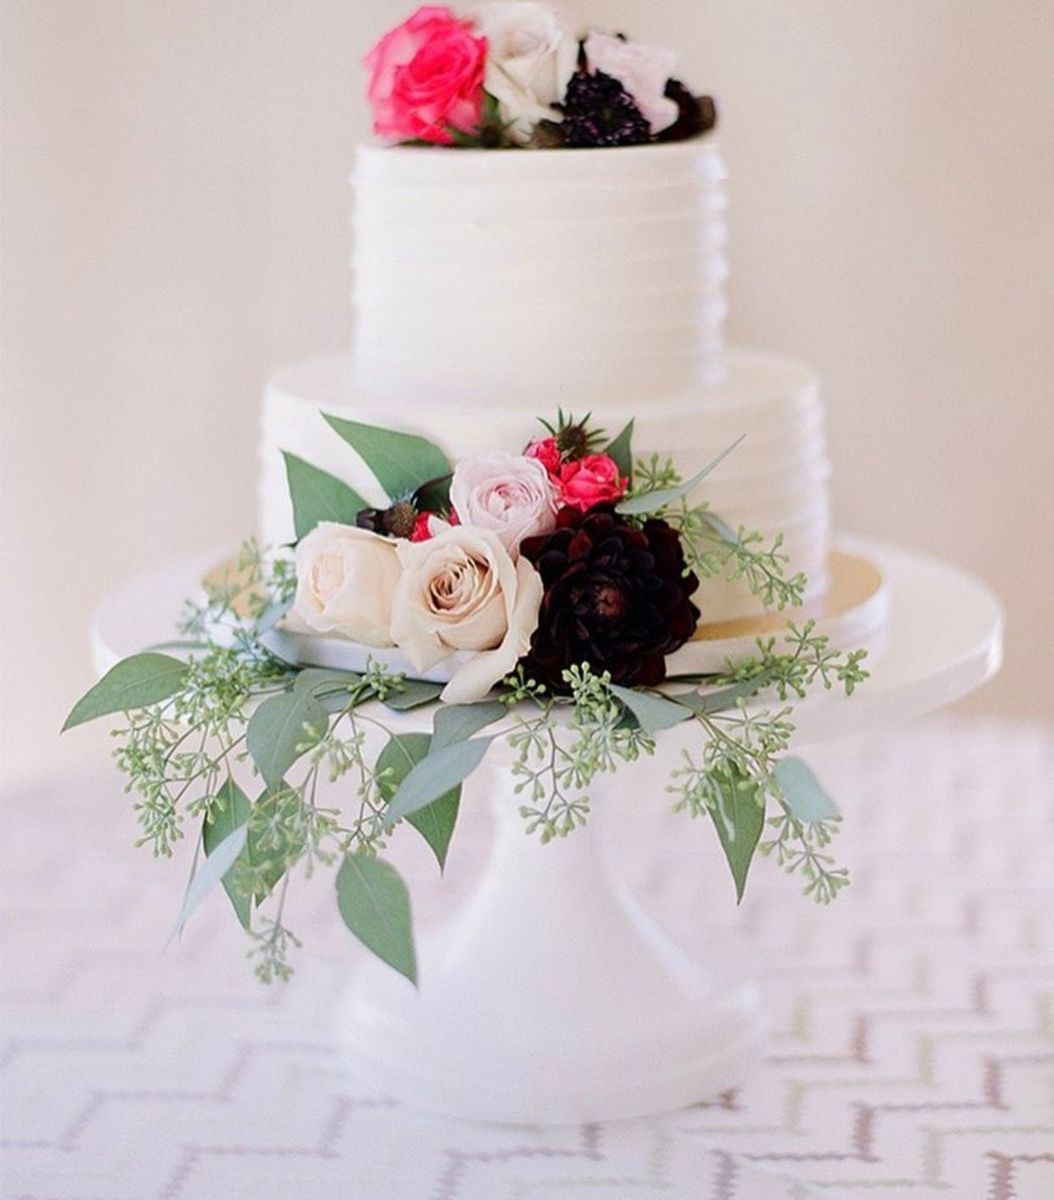 Flour Girl Wedding Cakes  Flour Girl Wedding Cakes Reviews South Lake Tahoe CA